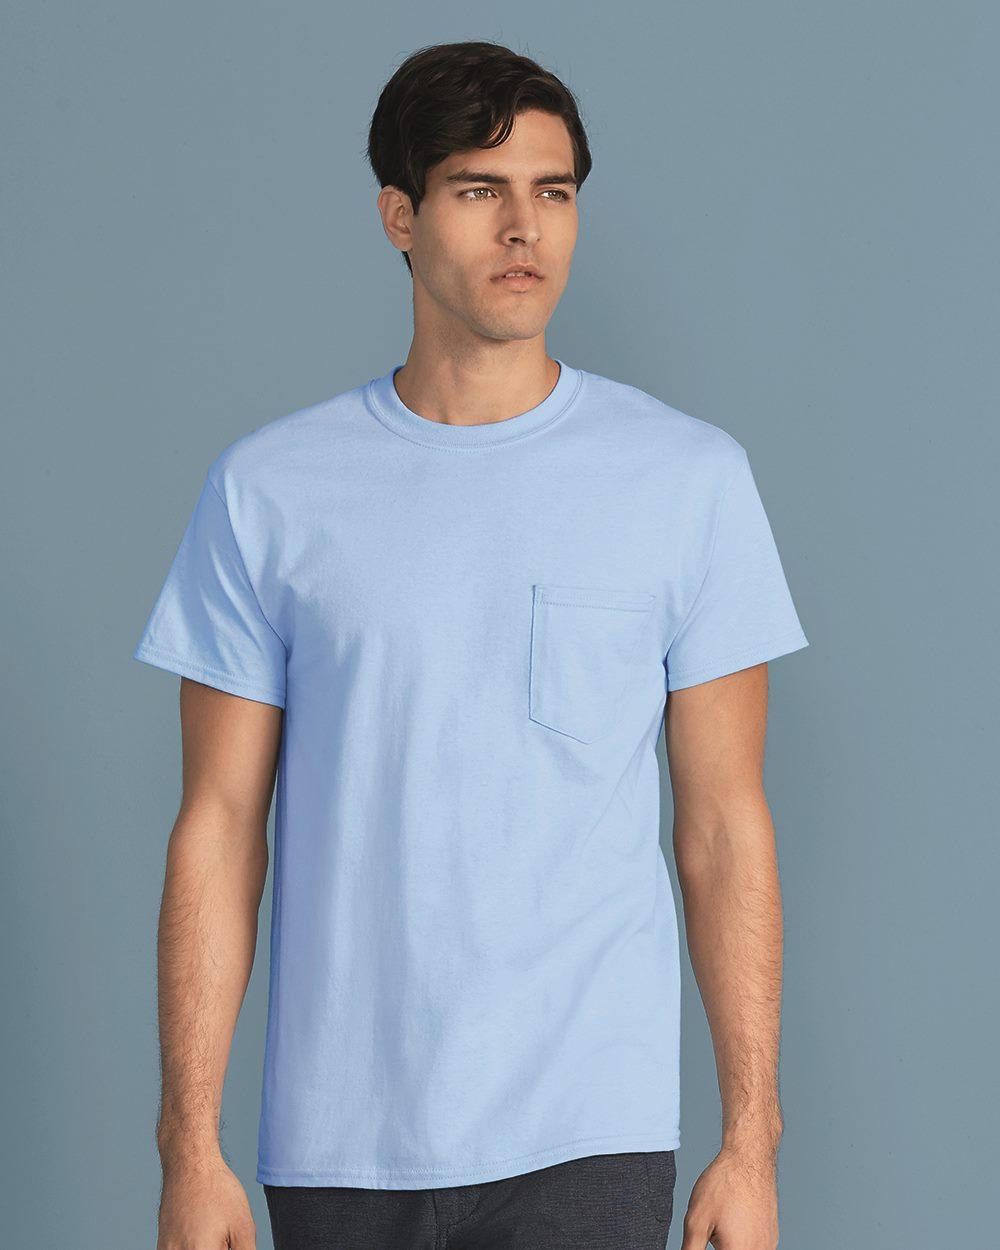 Gildan 2300 ultra cotton t shirt with a pocket for Gildan t shirt printing